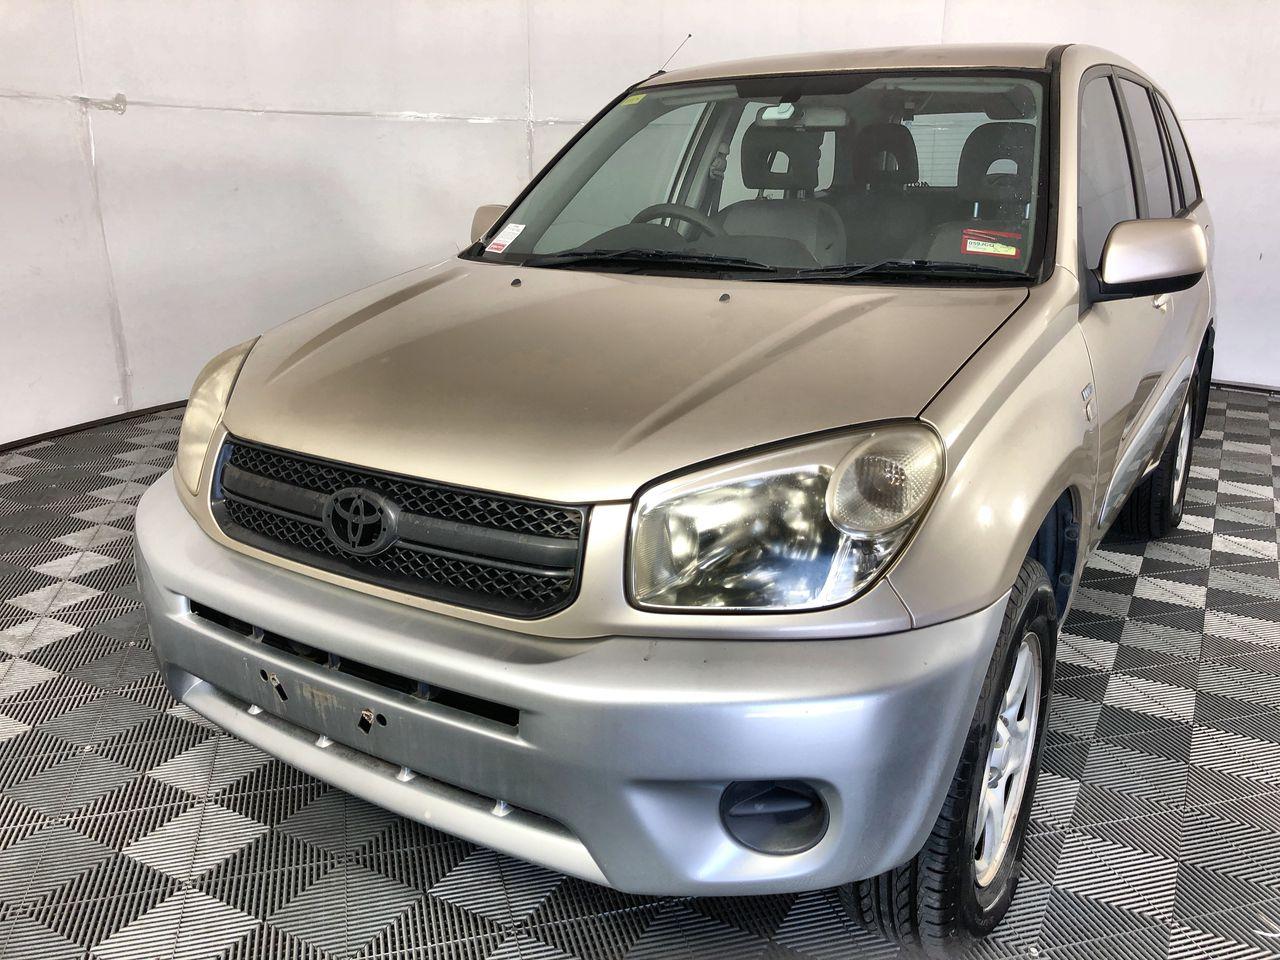 2005 Toyota Rav 4 CV (4x4) ACA23R Wagon 147,823km